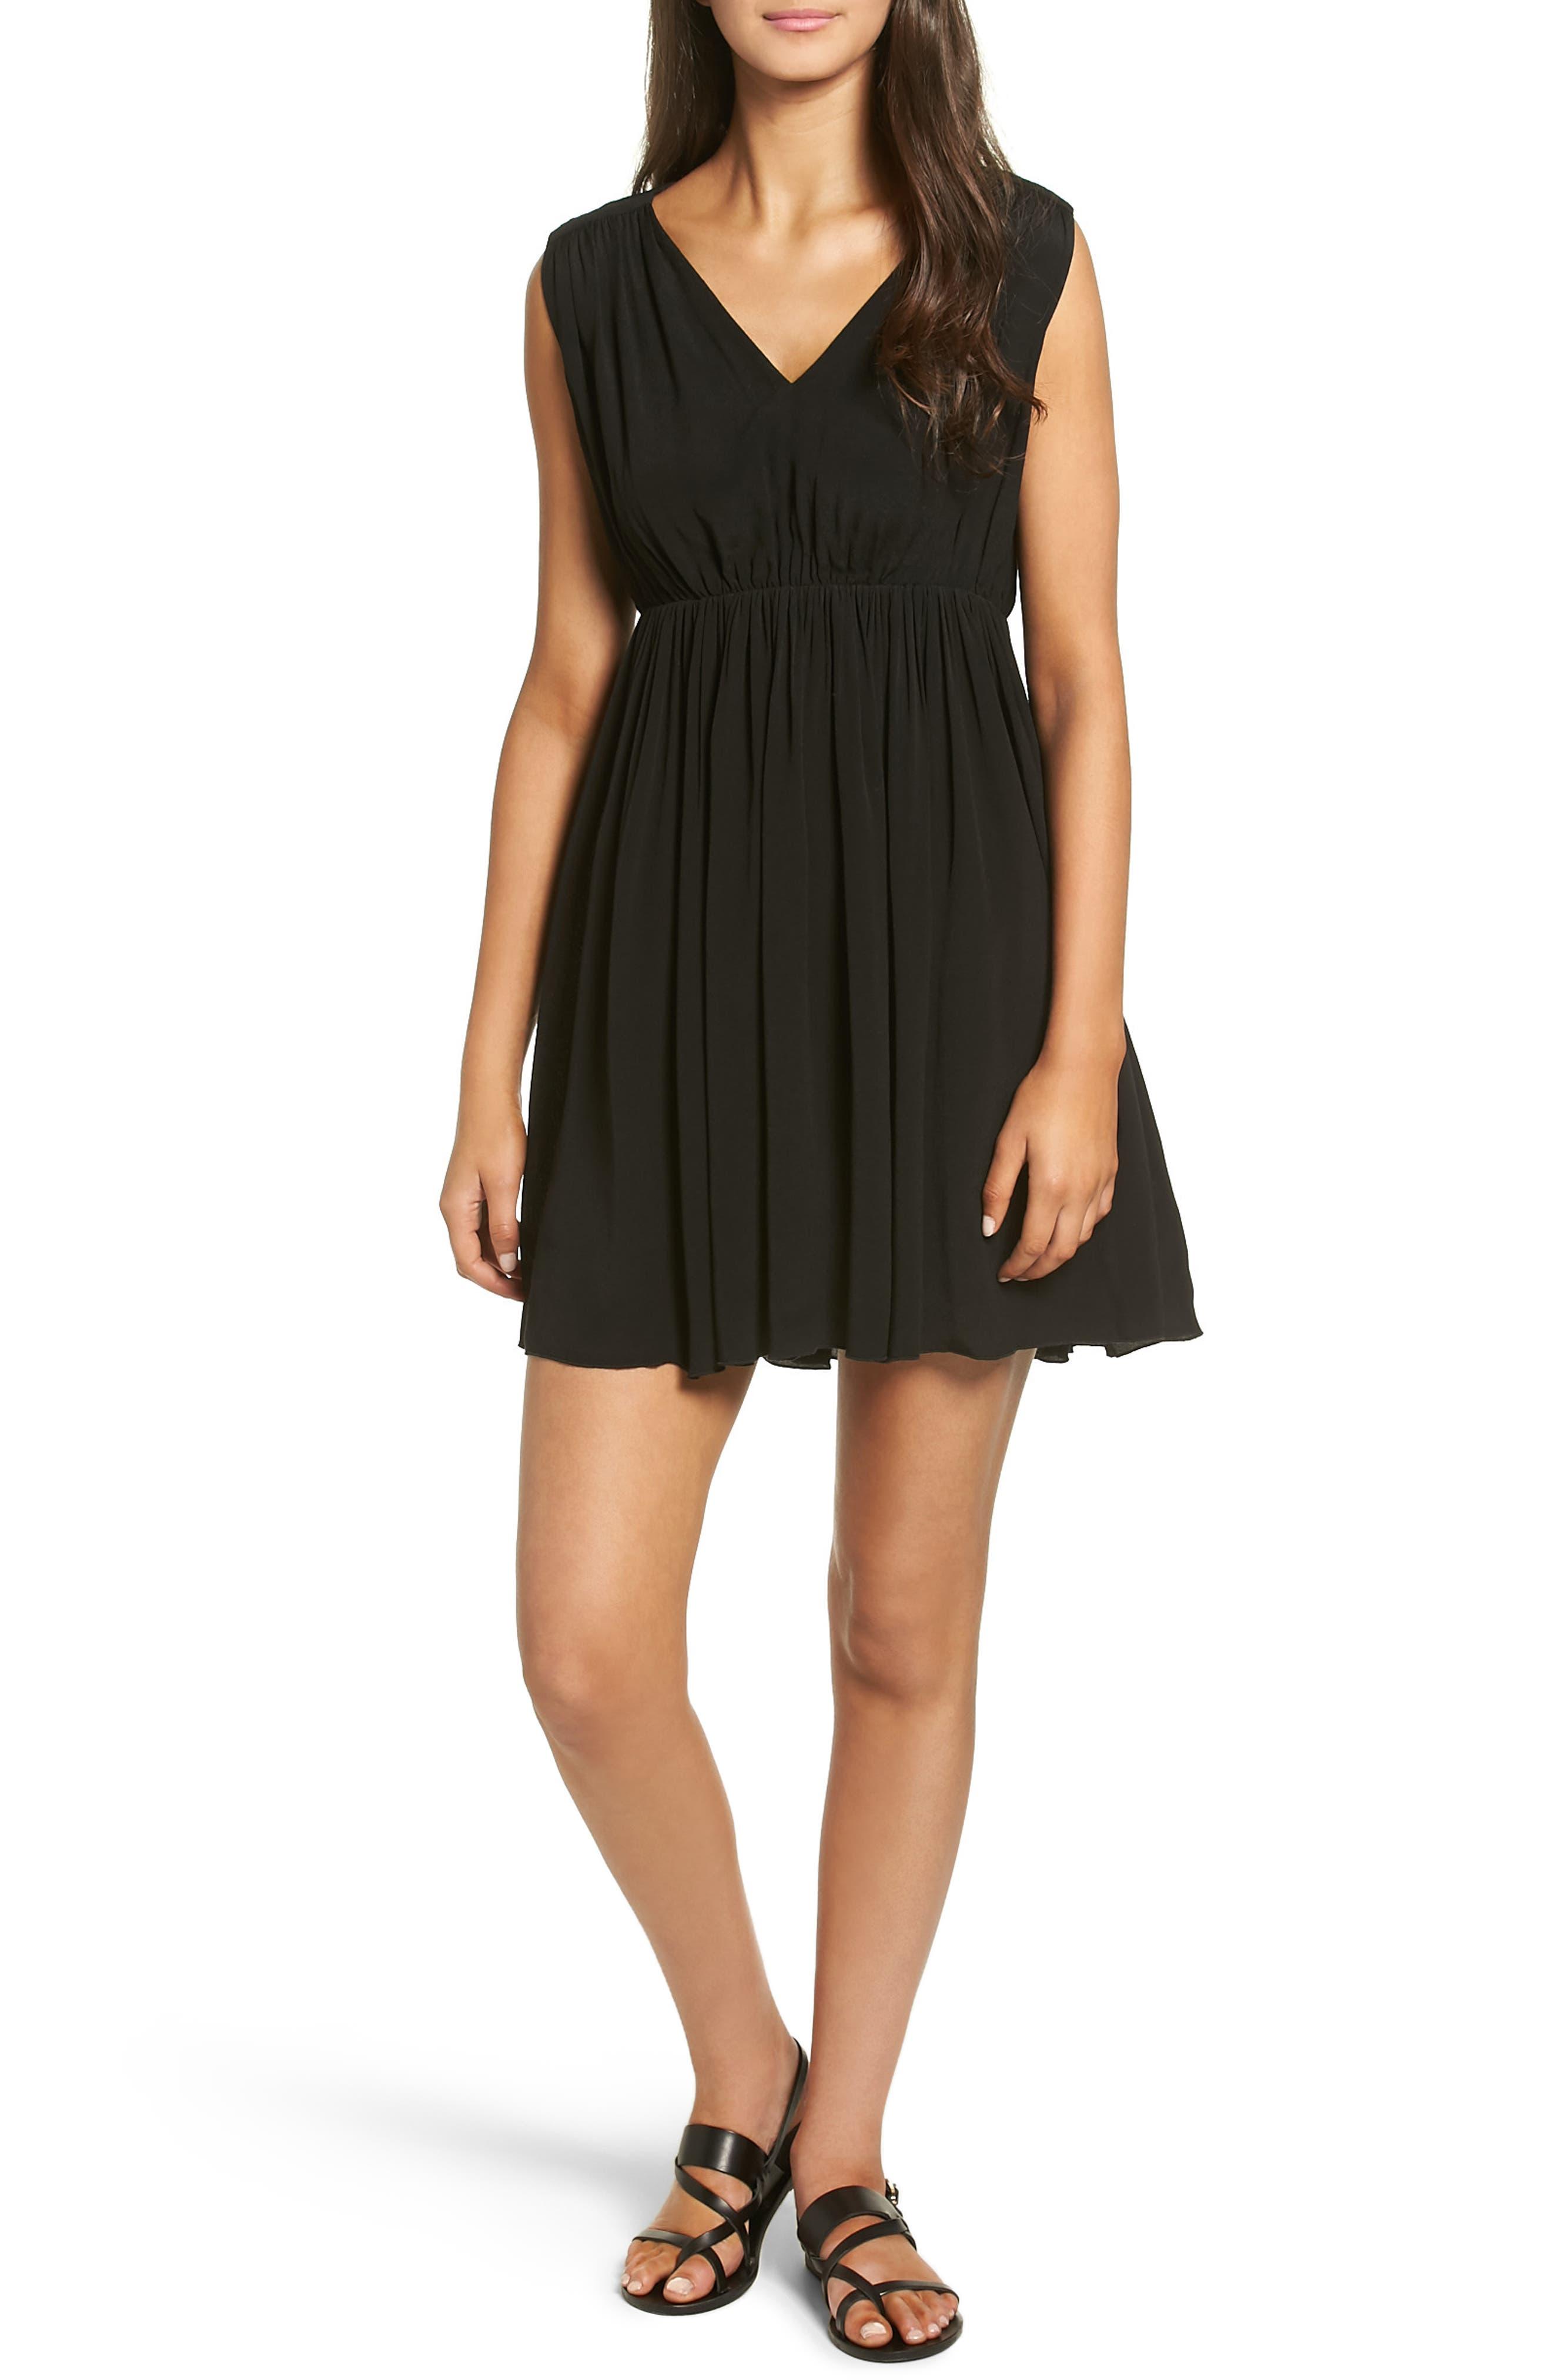 Alternate Image 1 Selected - Madewell Magnolia Tie Back Dress